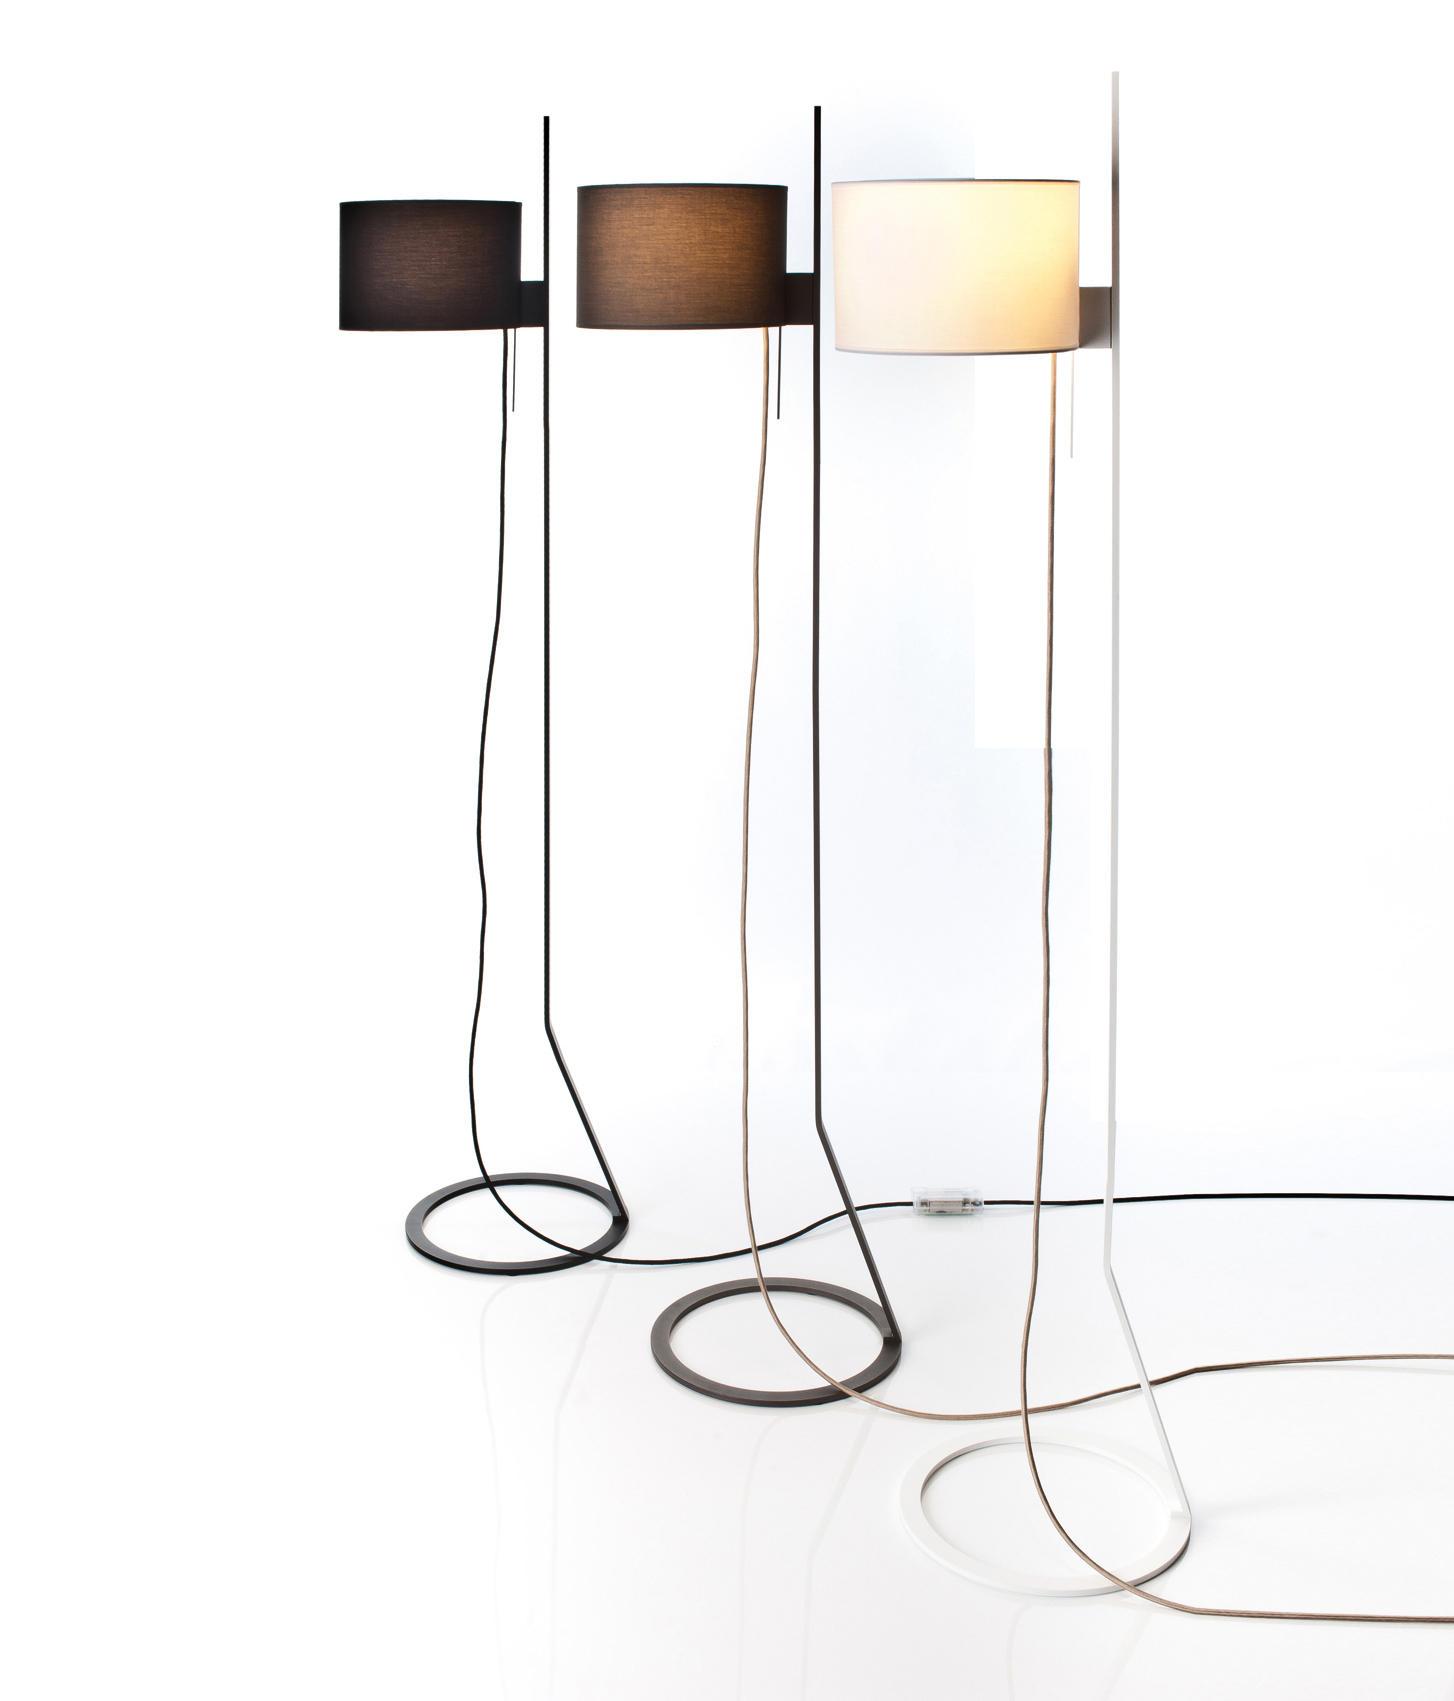 Steng Licht loft standing lamps general lighting from steng licht architonic